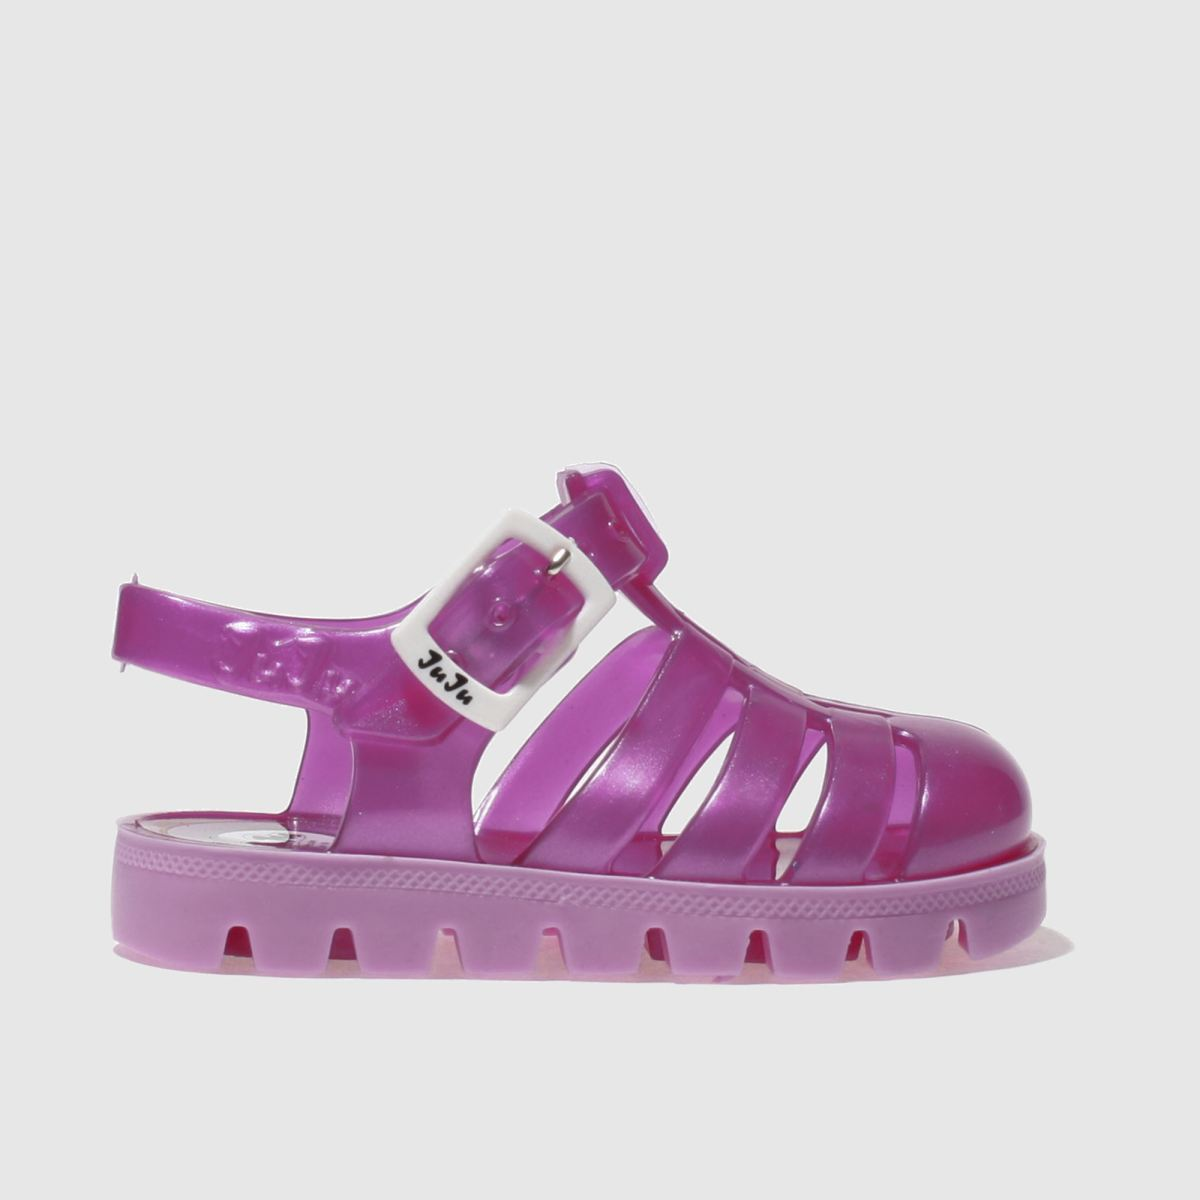 juju jellies Juju Jellies Pink Nino Girls Toddler Sandals